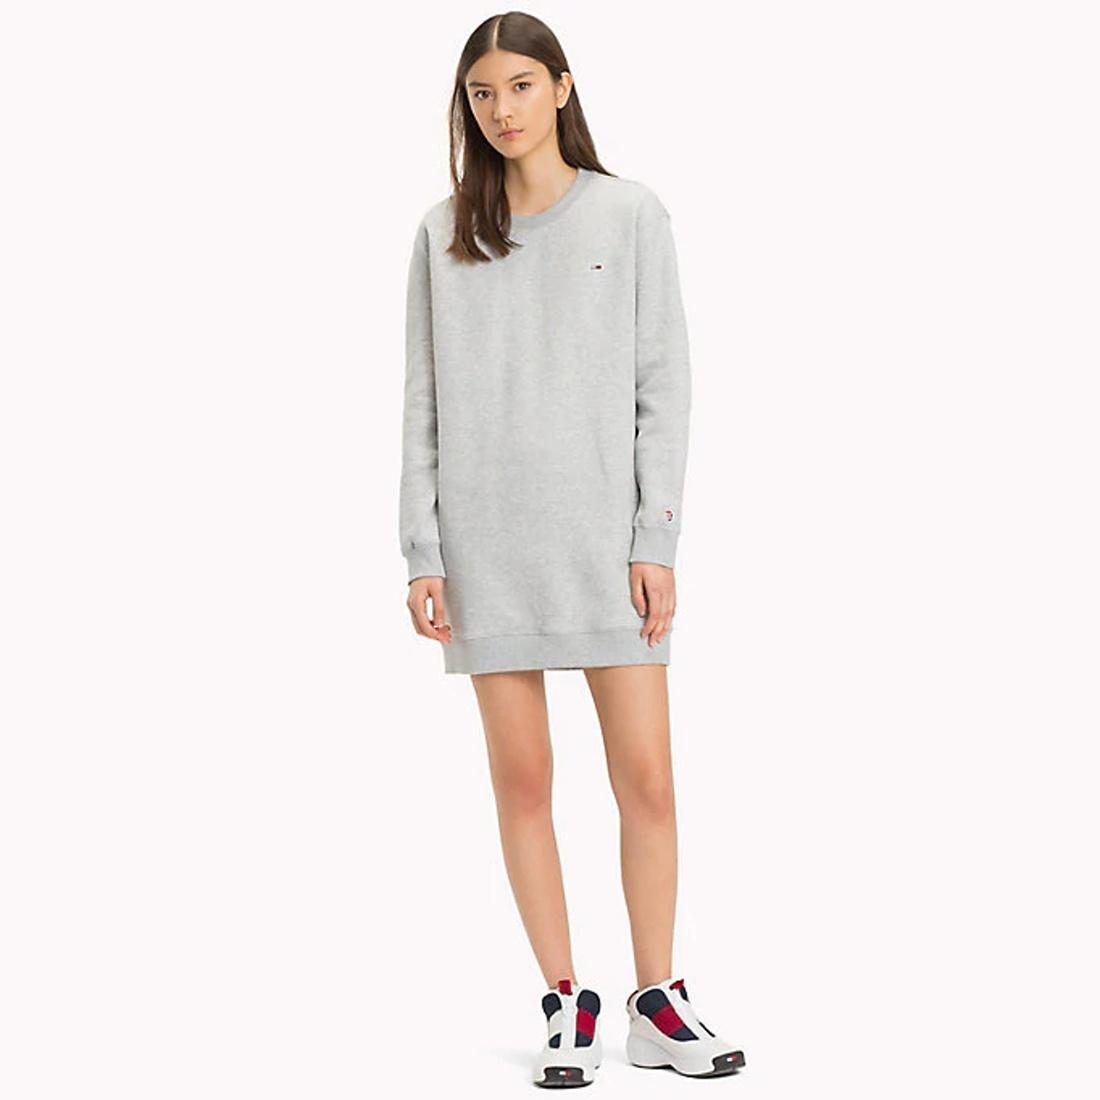 d97cbb948a46 Tommy Hilfiger dámské šedé šaty Classics